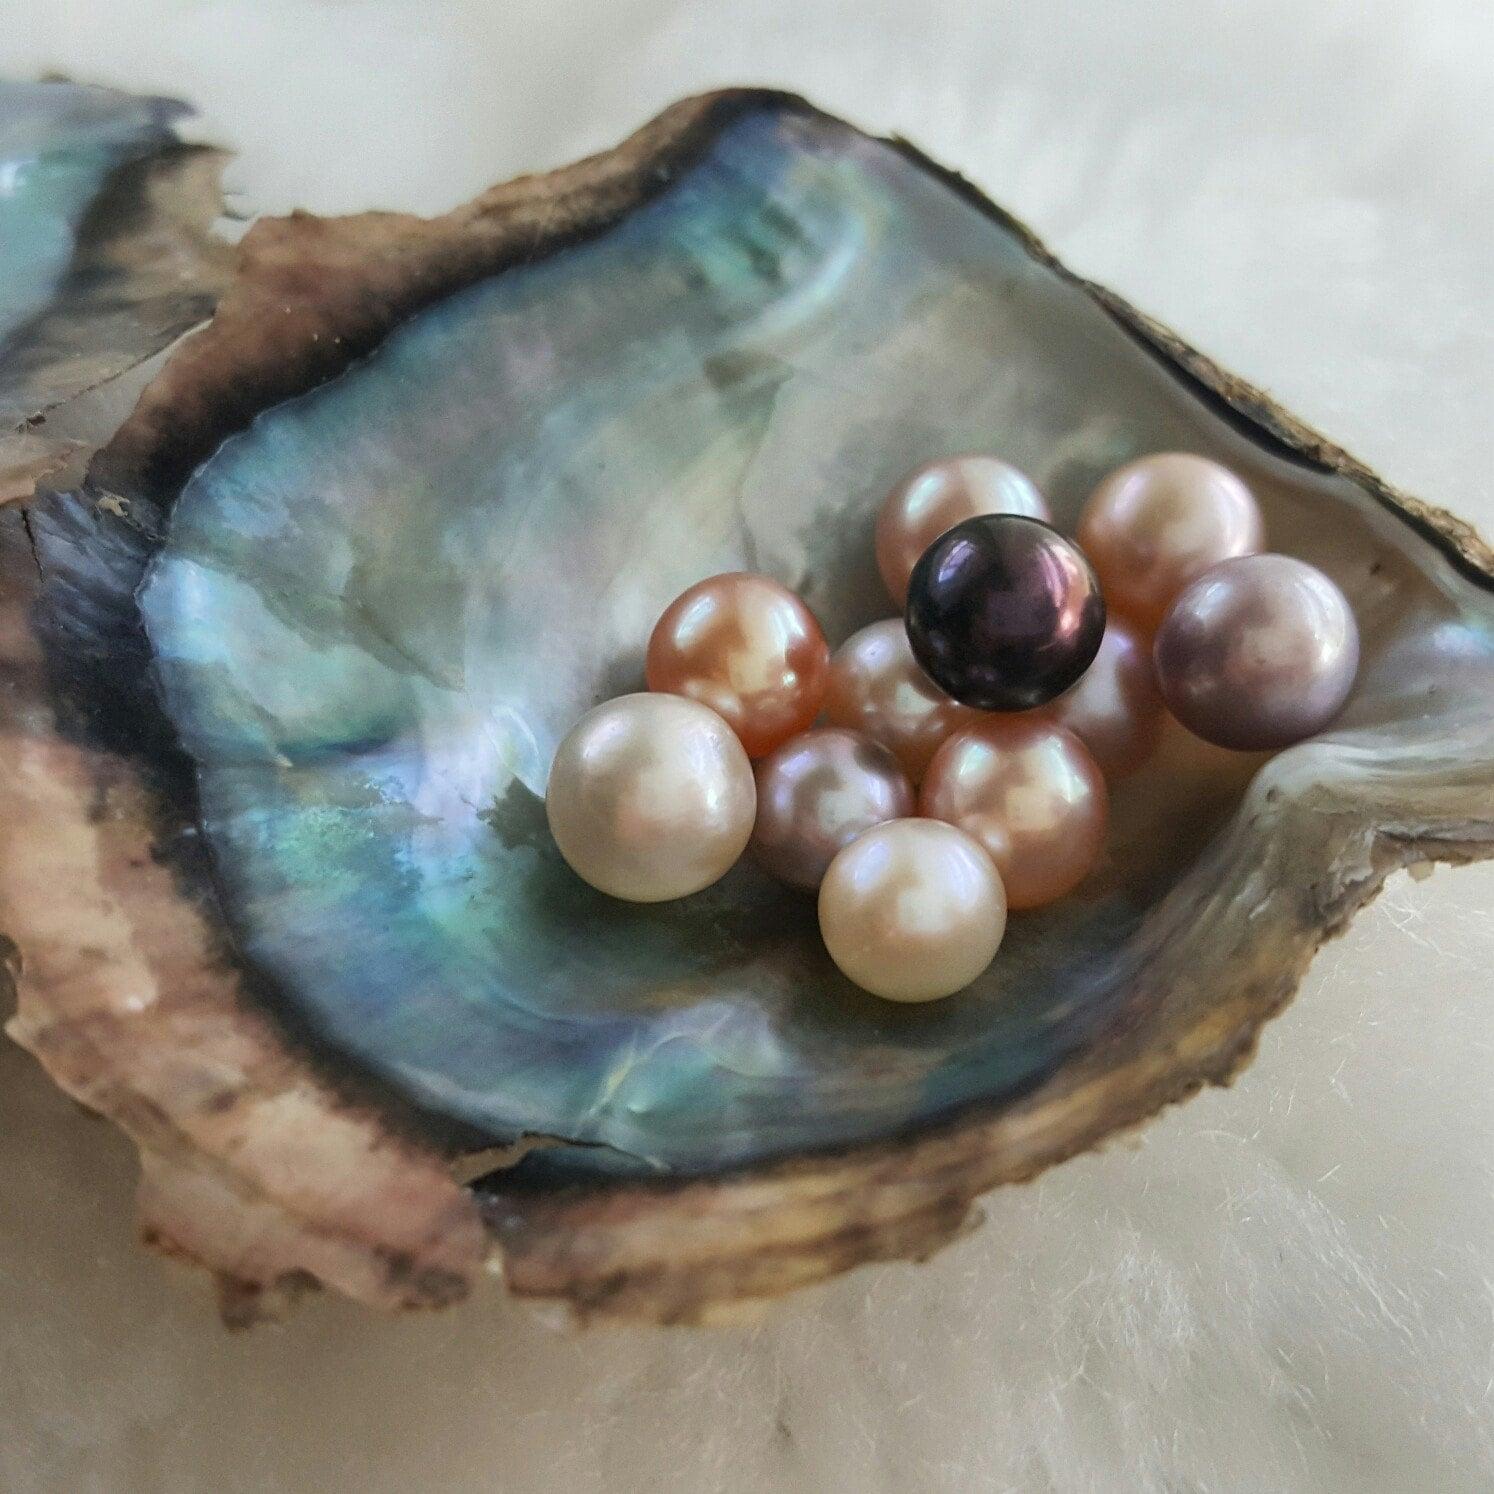 Pearl in Oyster Dream Interpretation